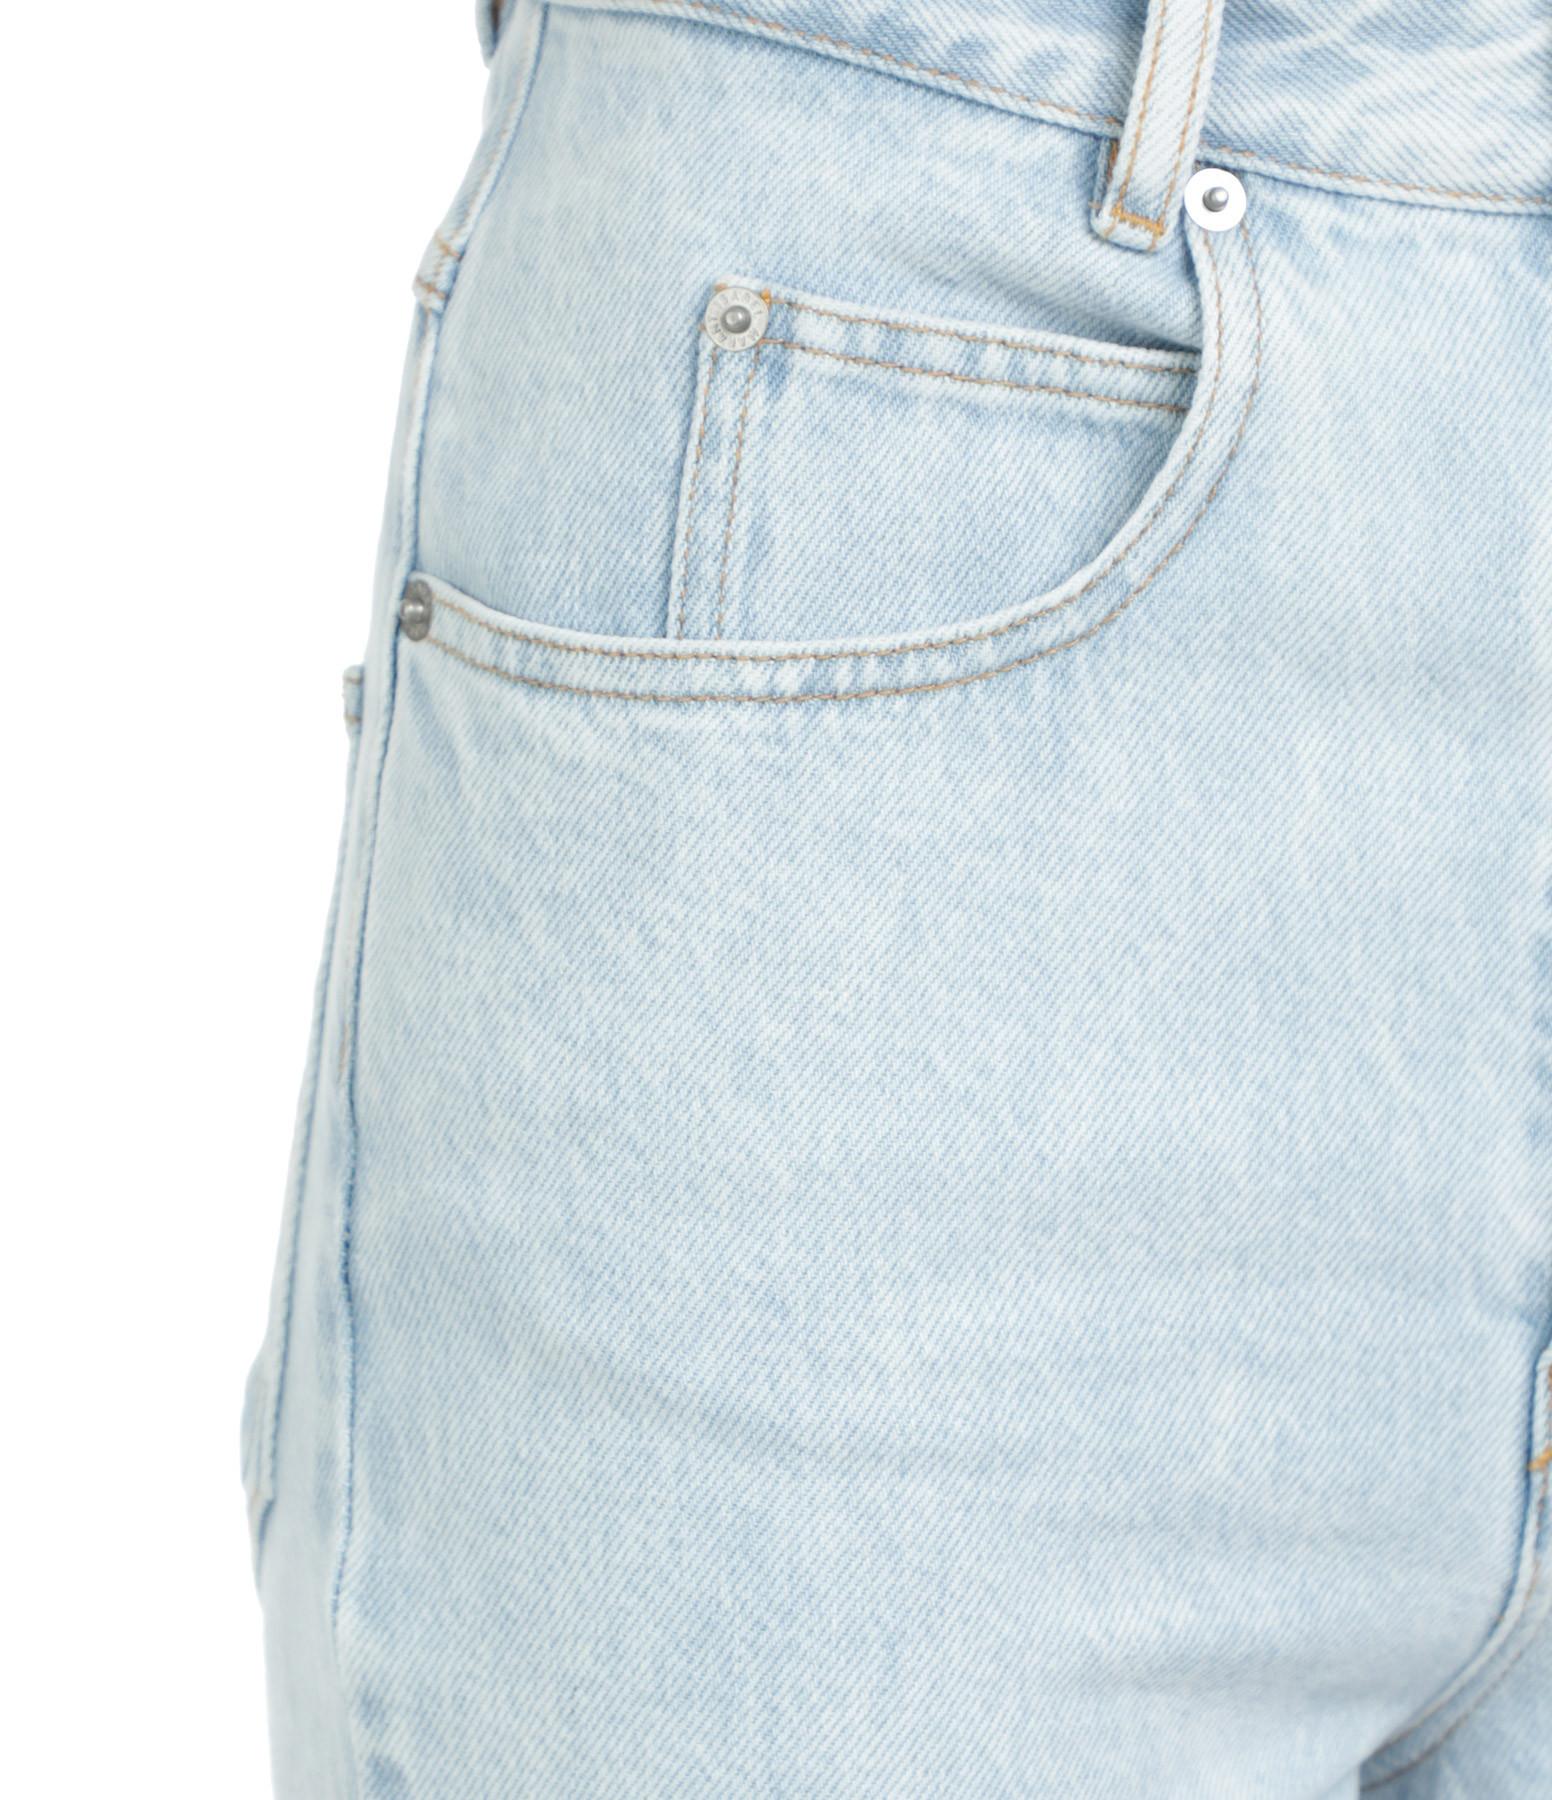 ISABEL MARANT ÉTOILE - Pantalon Laliskasr Coton Bleu Clair